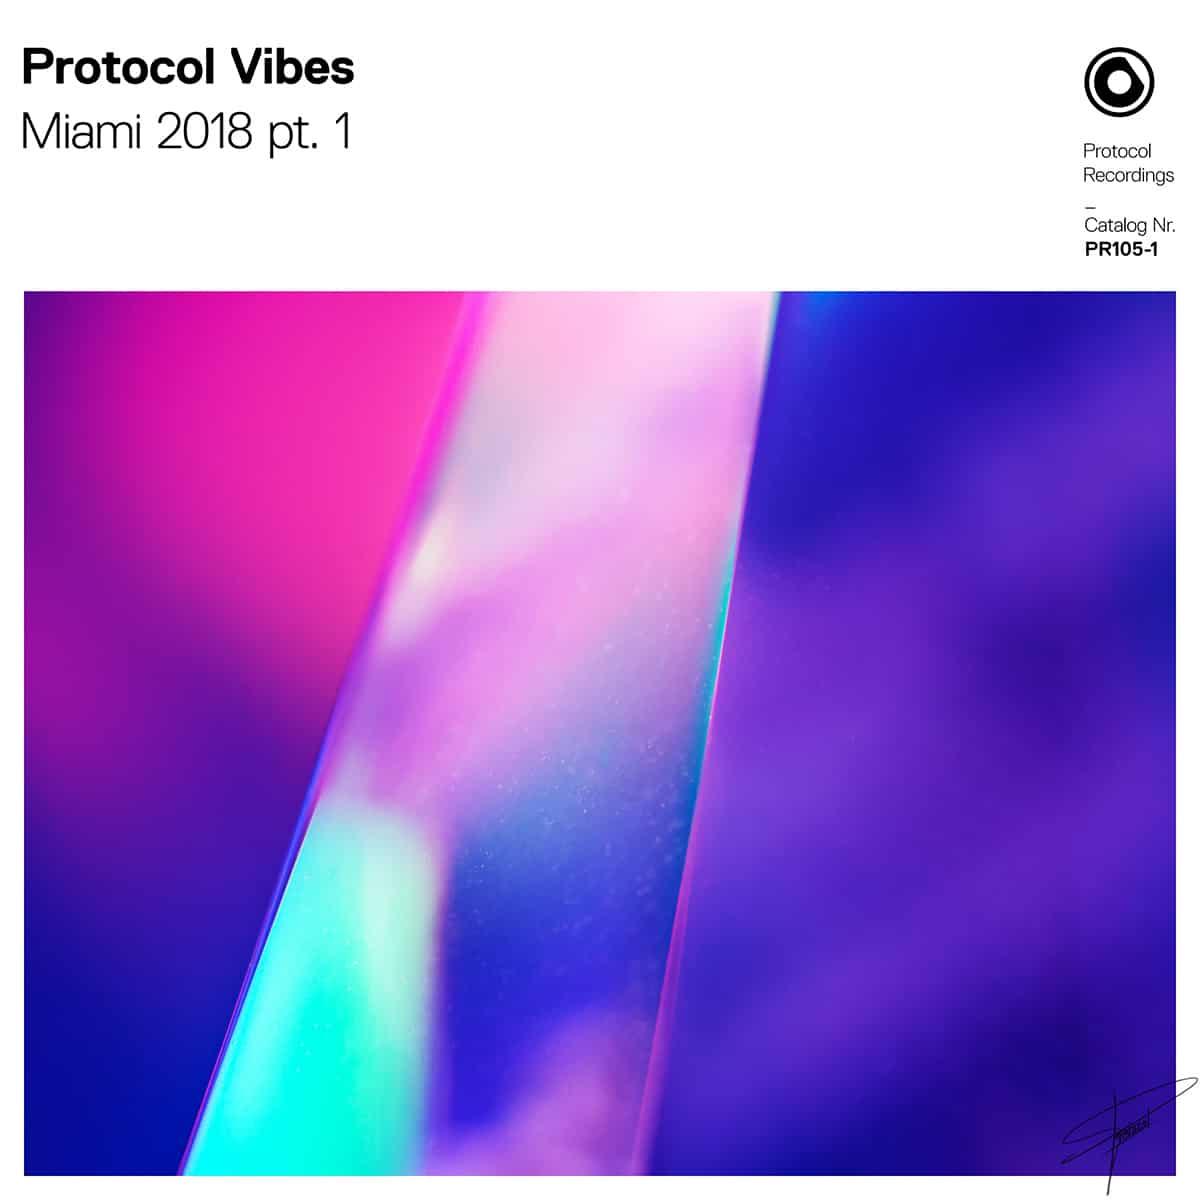 Nicky Romero's Records Label presents: Protocol Vibes – Miami 2018!